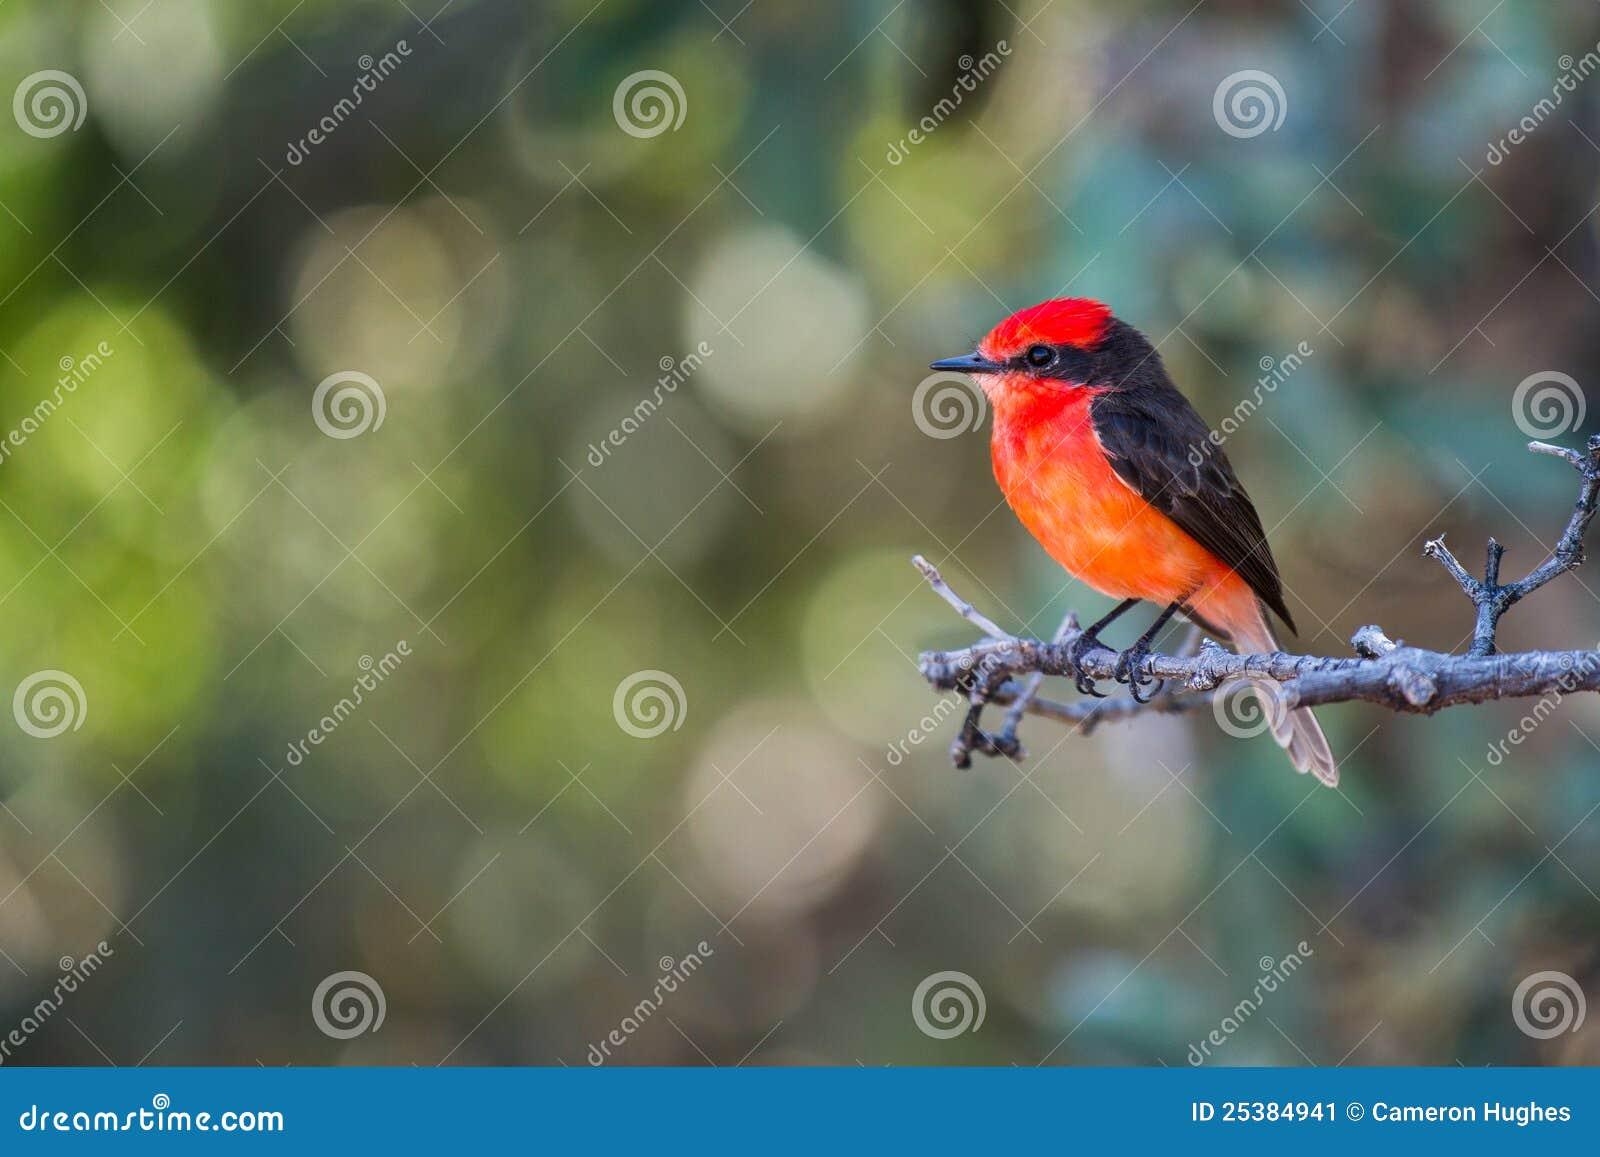 orange mit haube vogel stockbild bild 25384941. Black Bedroom Furniture Sets. Home Design Ideas